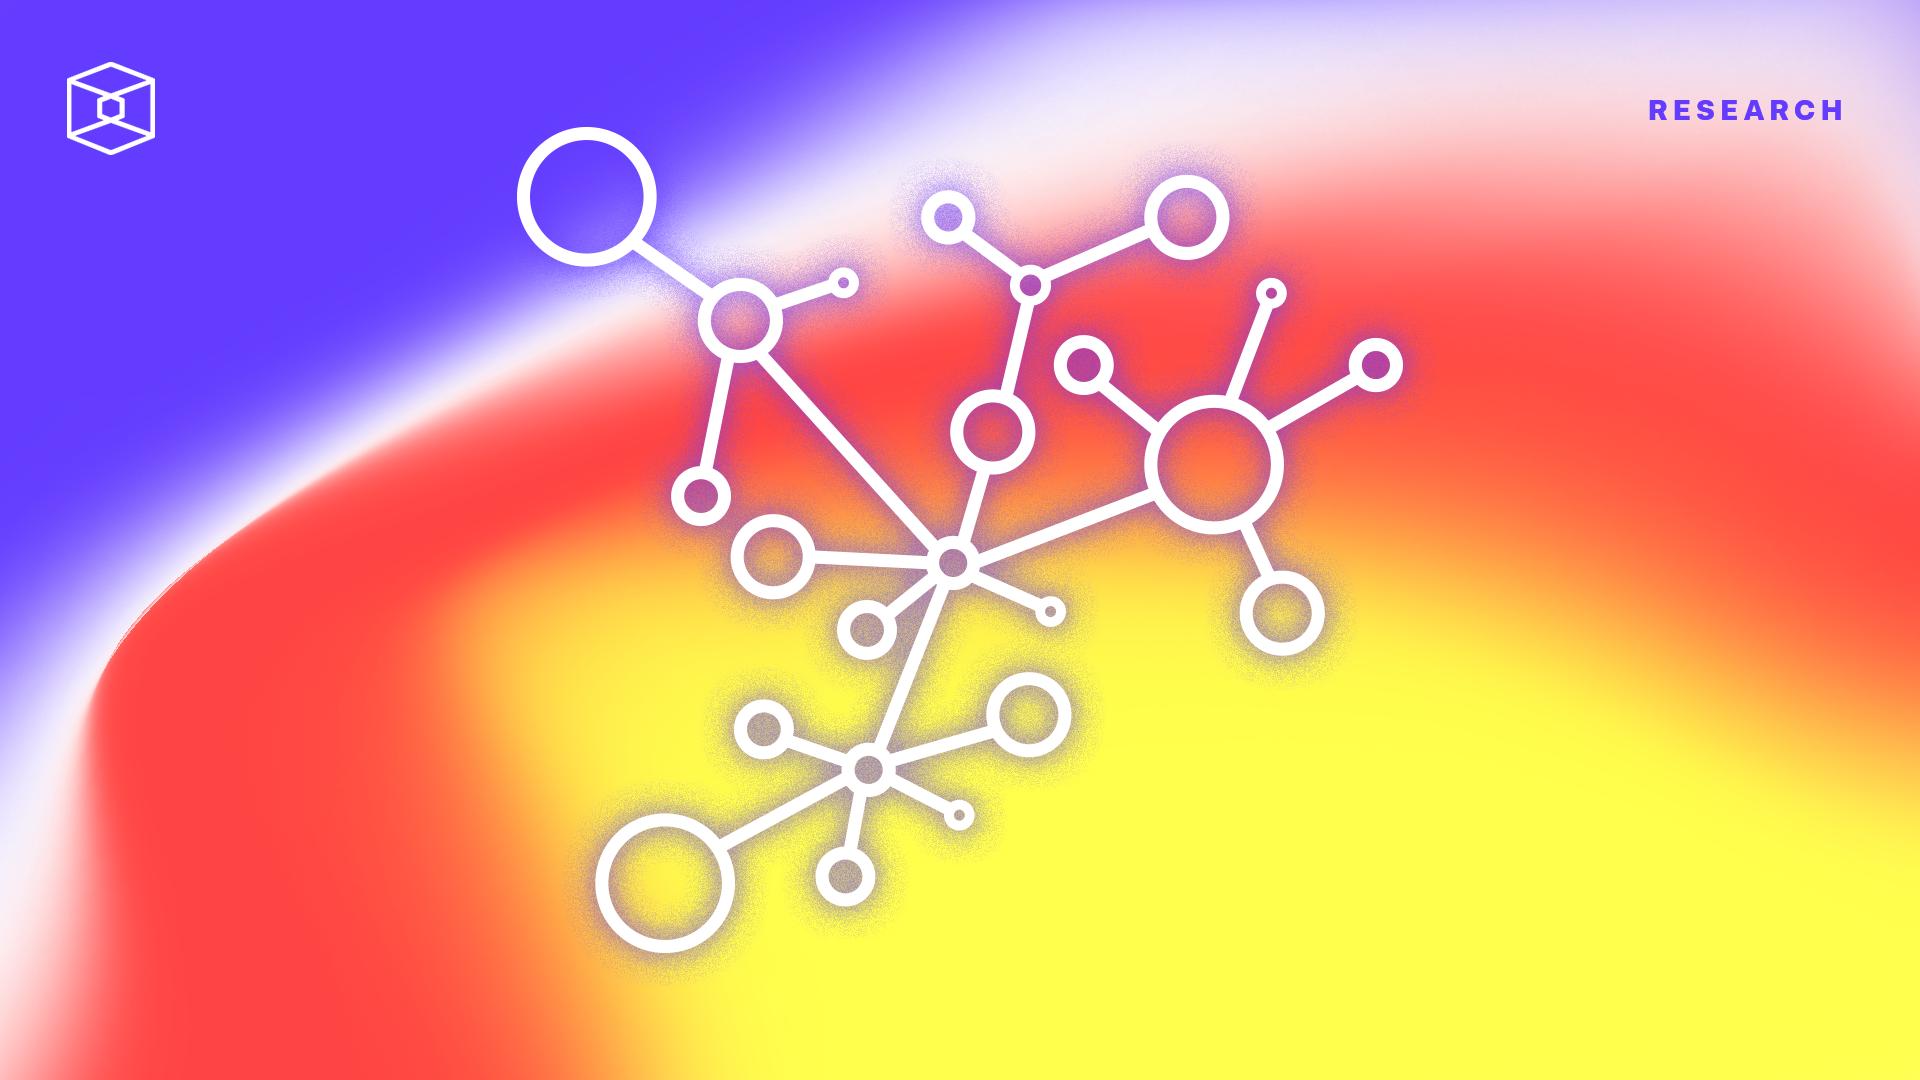 A simple framework for understanding Web3 vs. Web2 technology